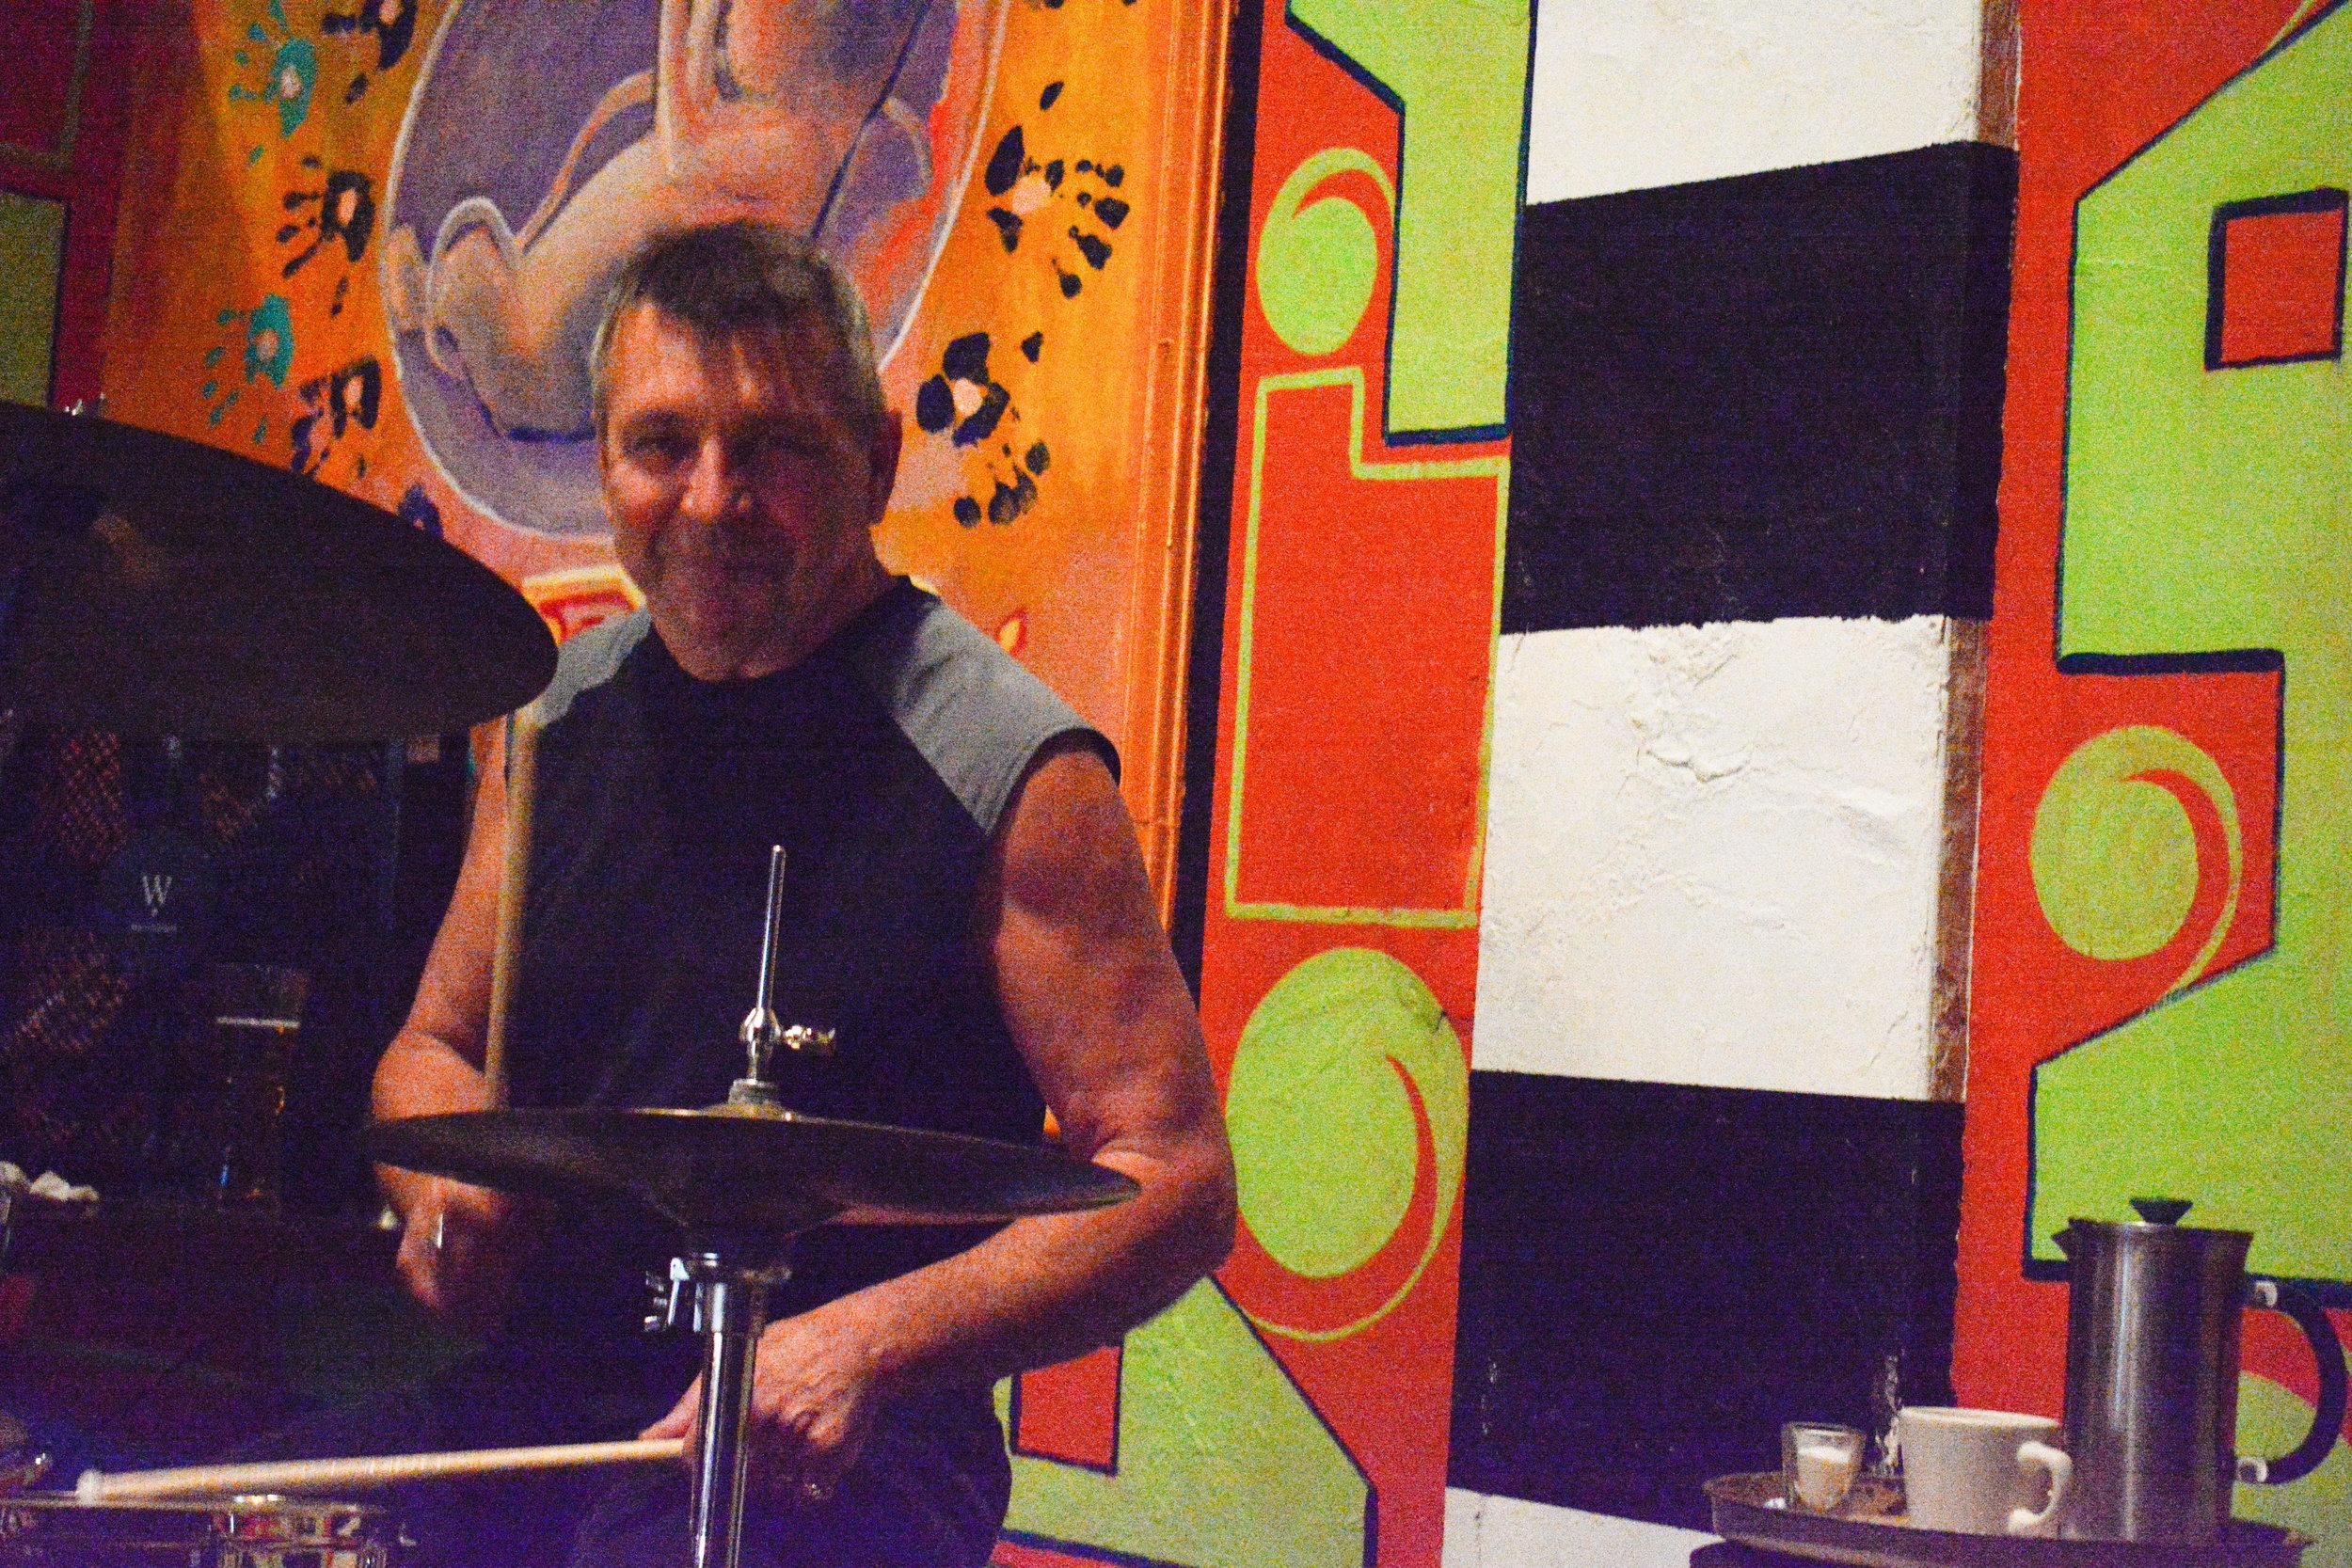 Guest Drummer, Will Schulmeister